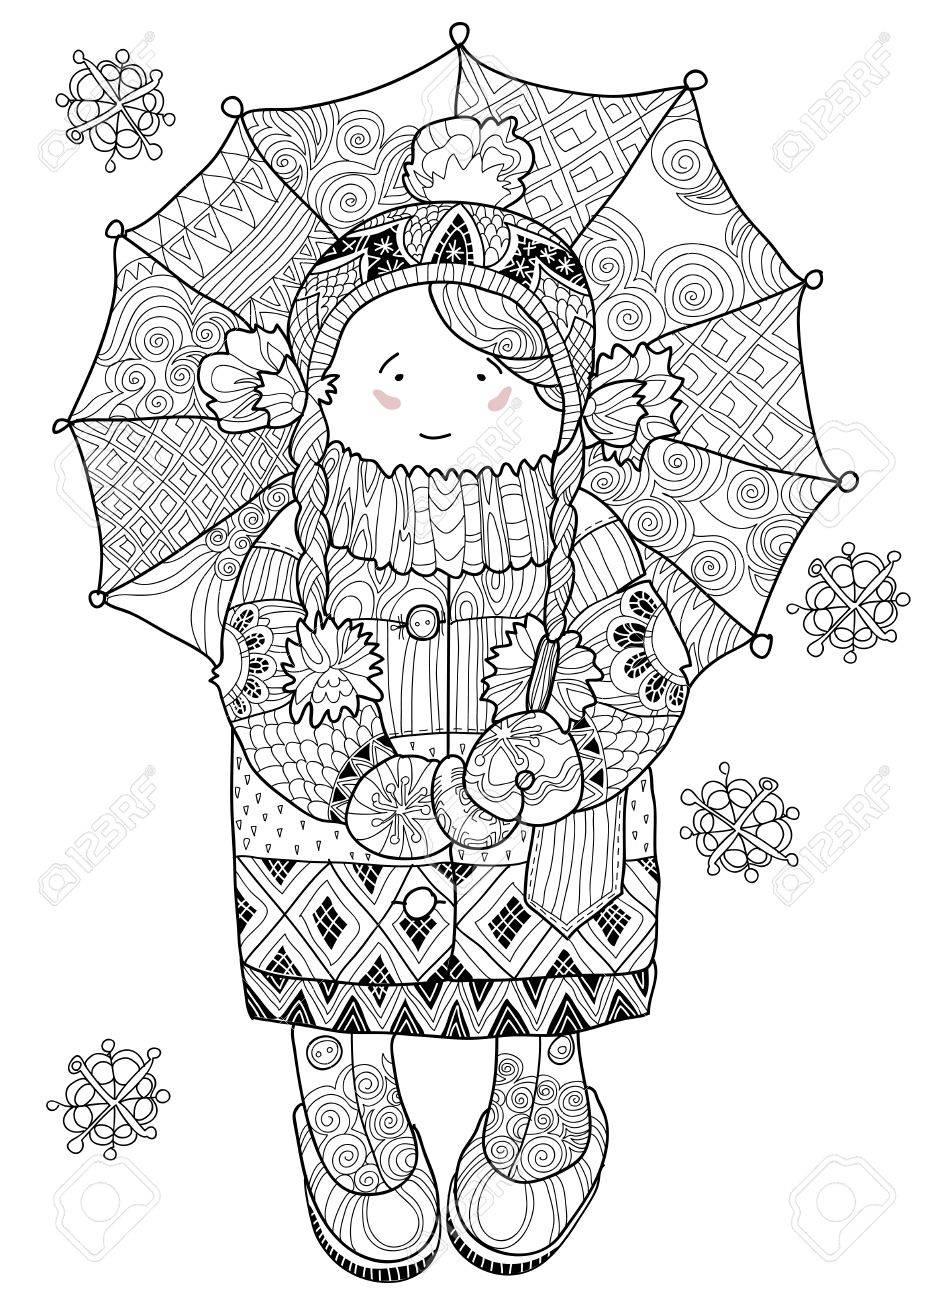 vector illustration doodle in winter snow under umbrella